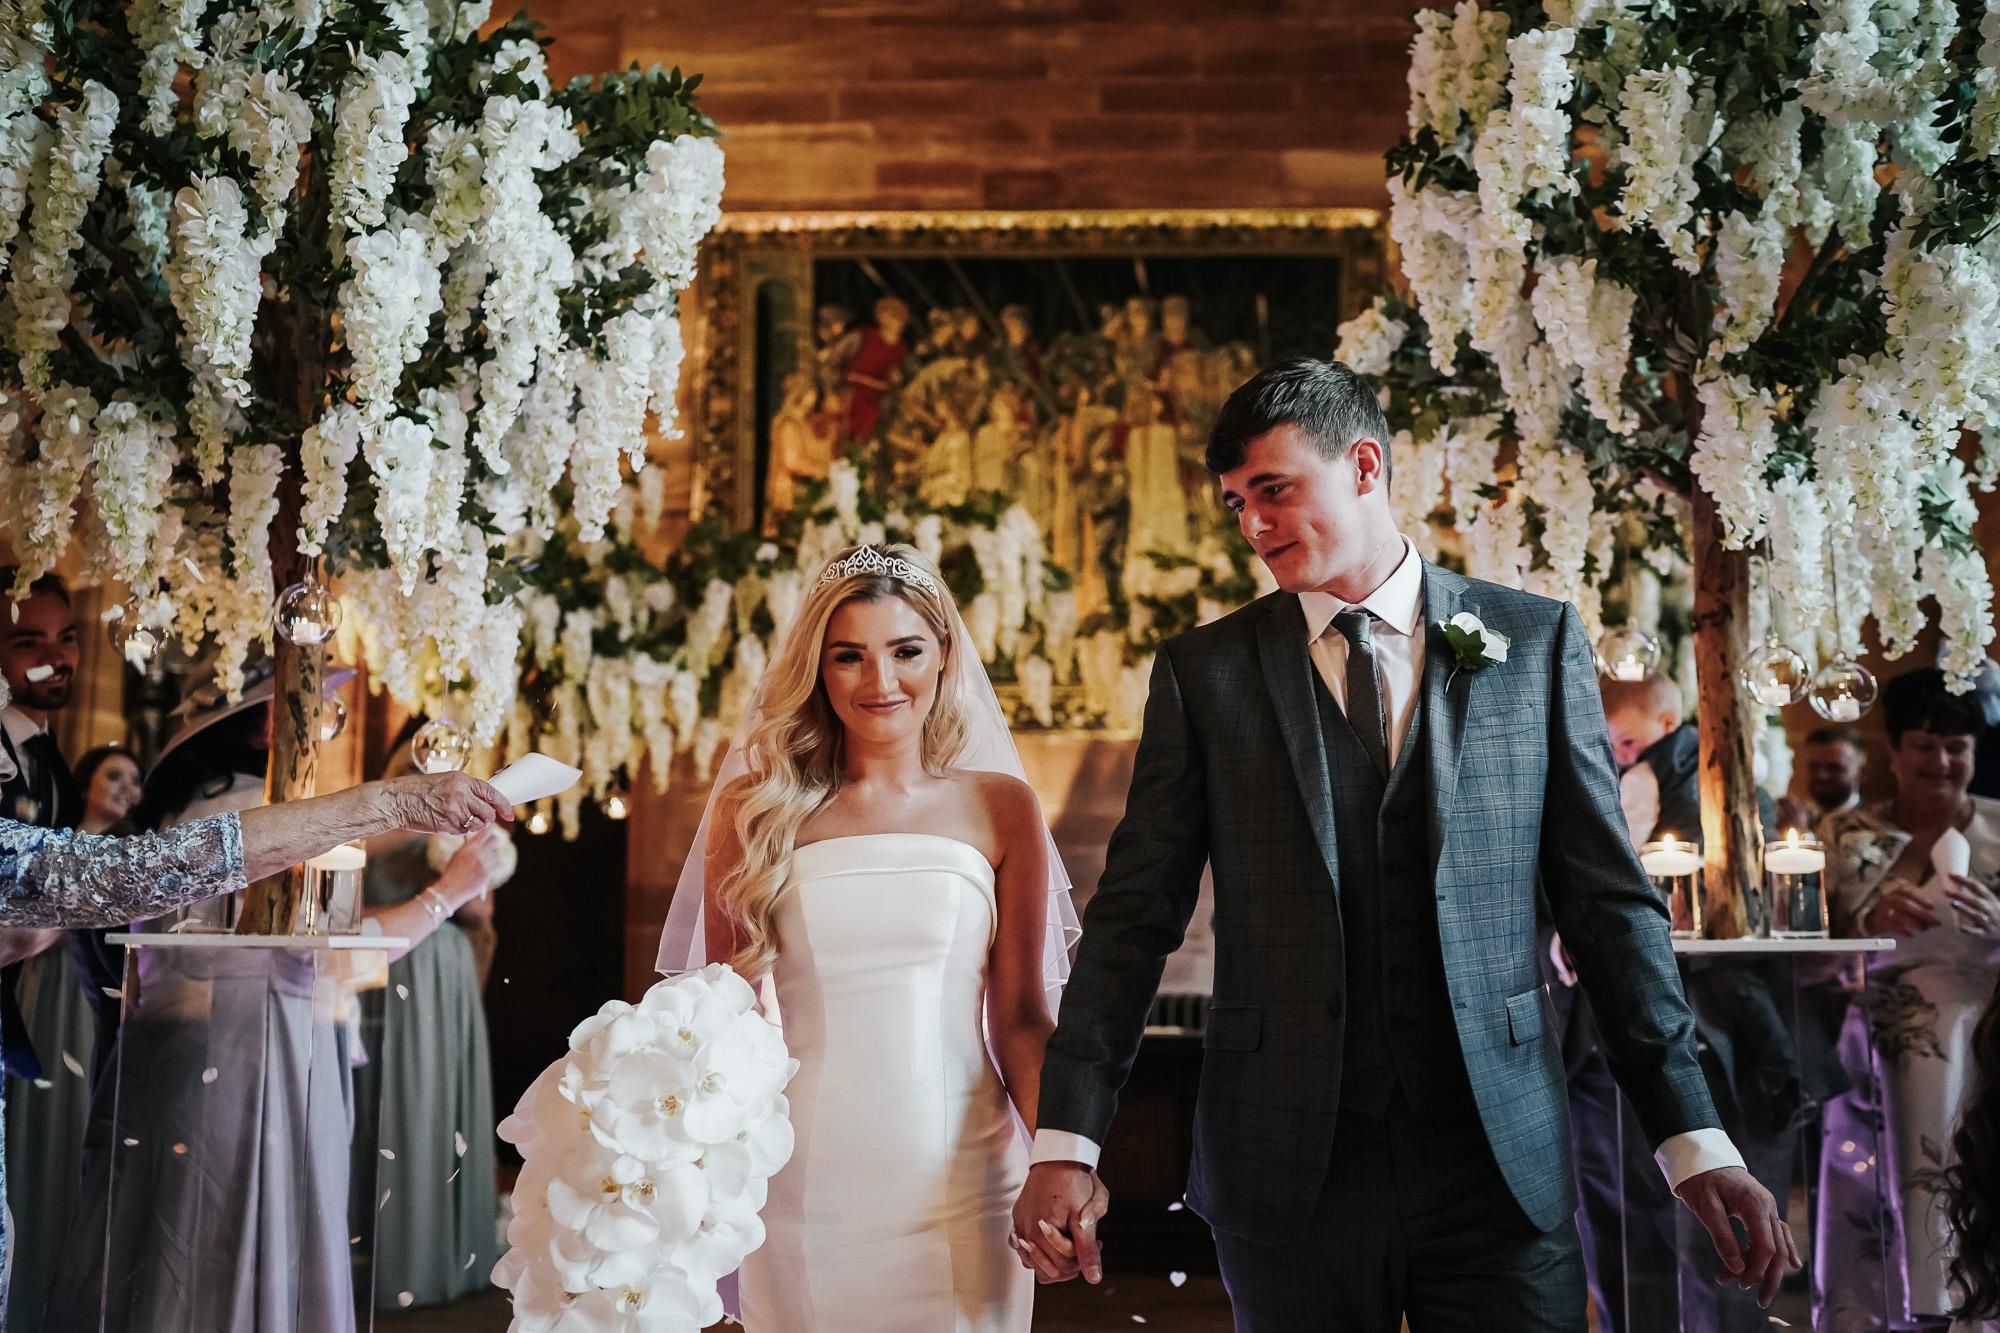 Peckforton Castle wedding photography cheshire wedding photographer (24 of 57).jpg